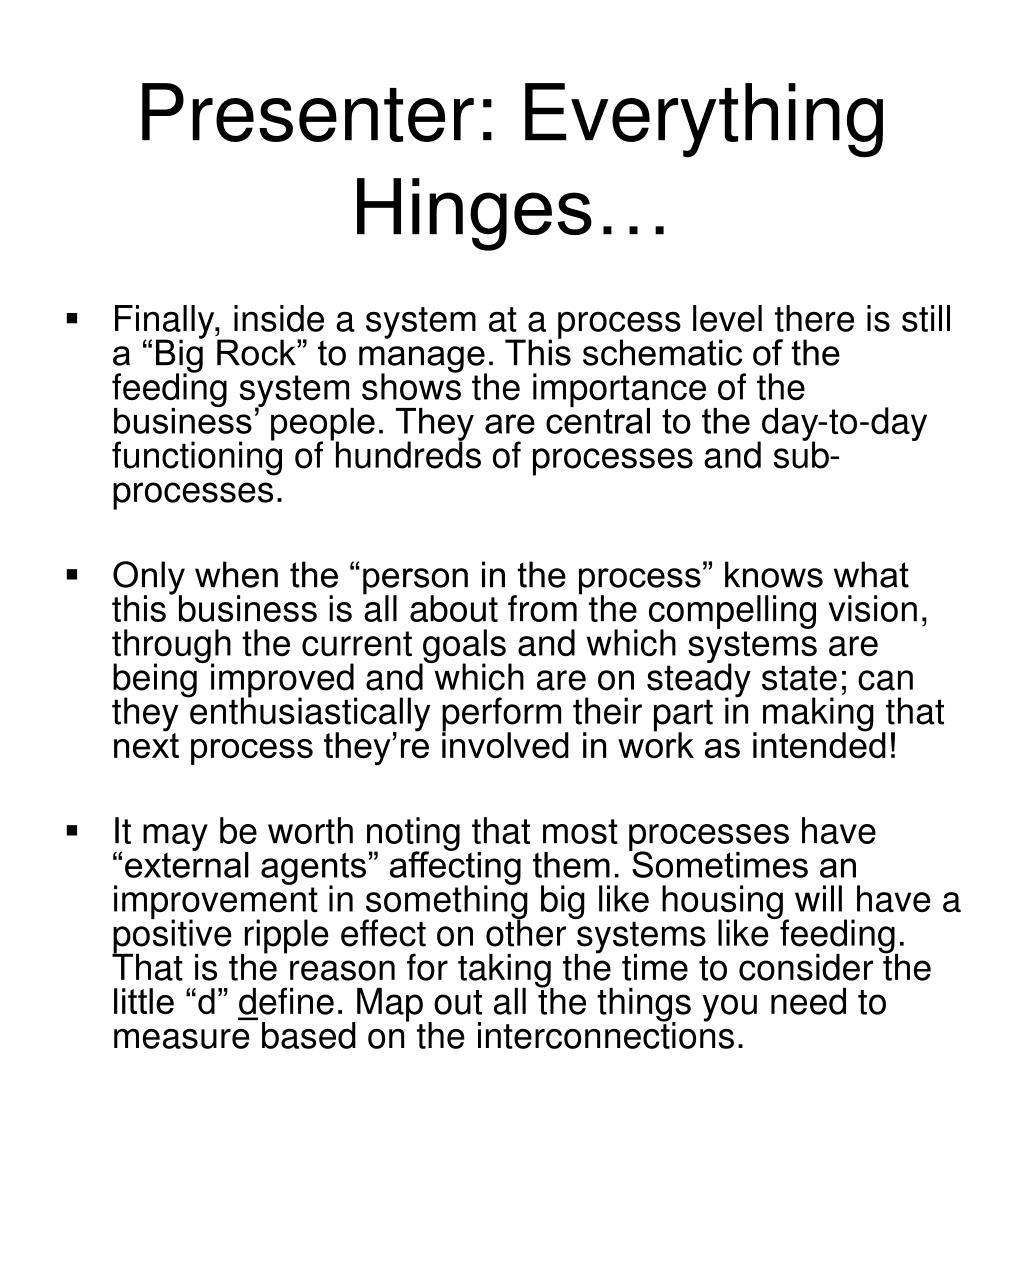 Presenter: Everything Hinges…